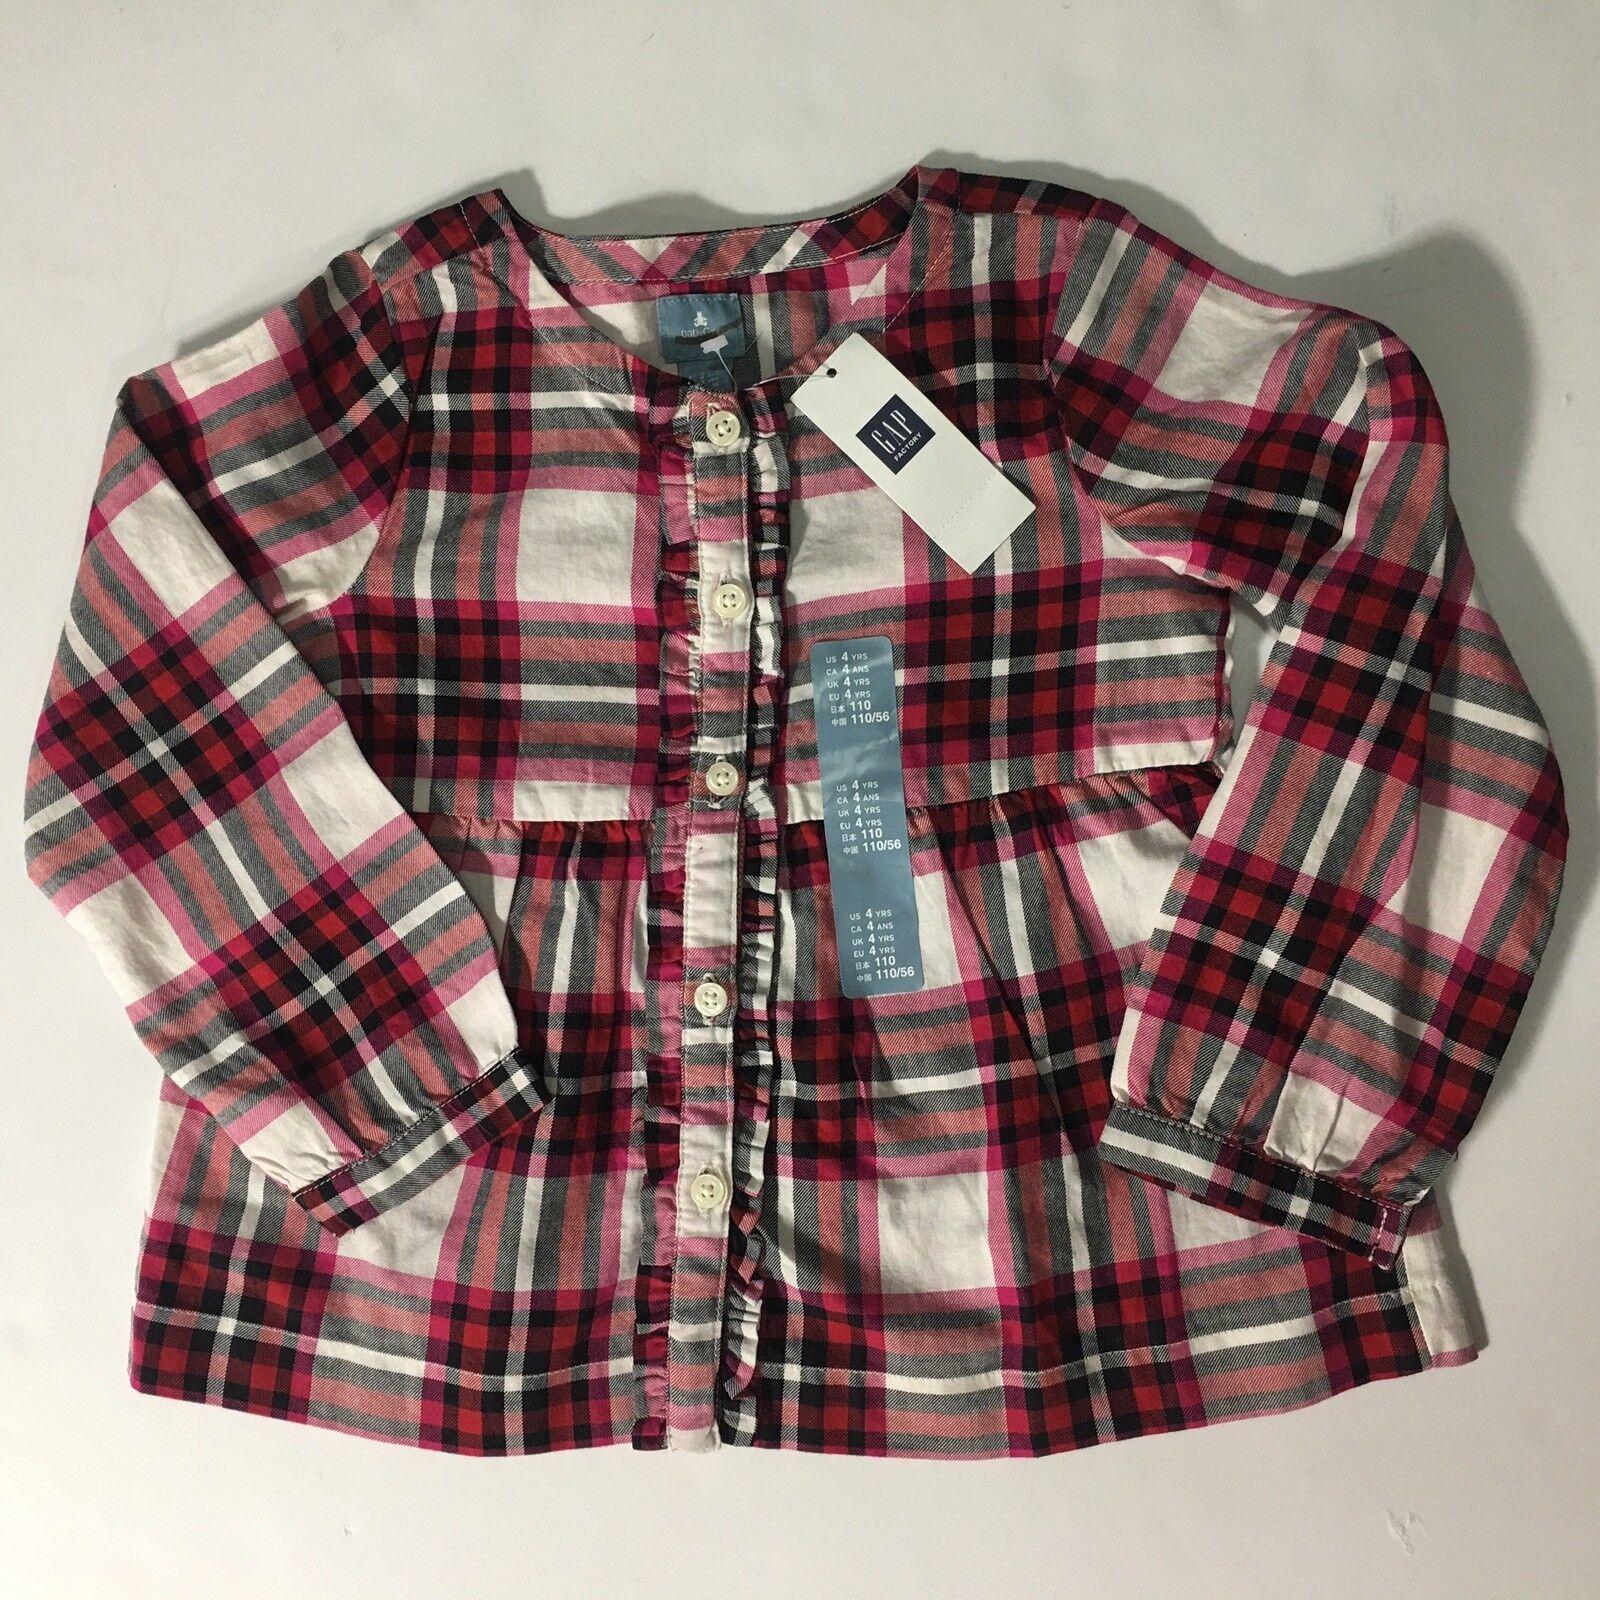 Baby Gap Girls Plaid Smock Long Sleeve Shirt Top Red Black Pink 4